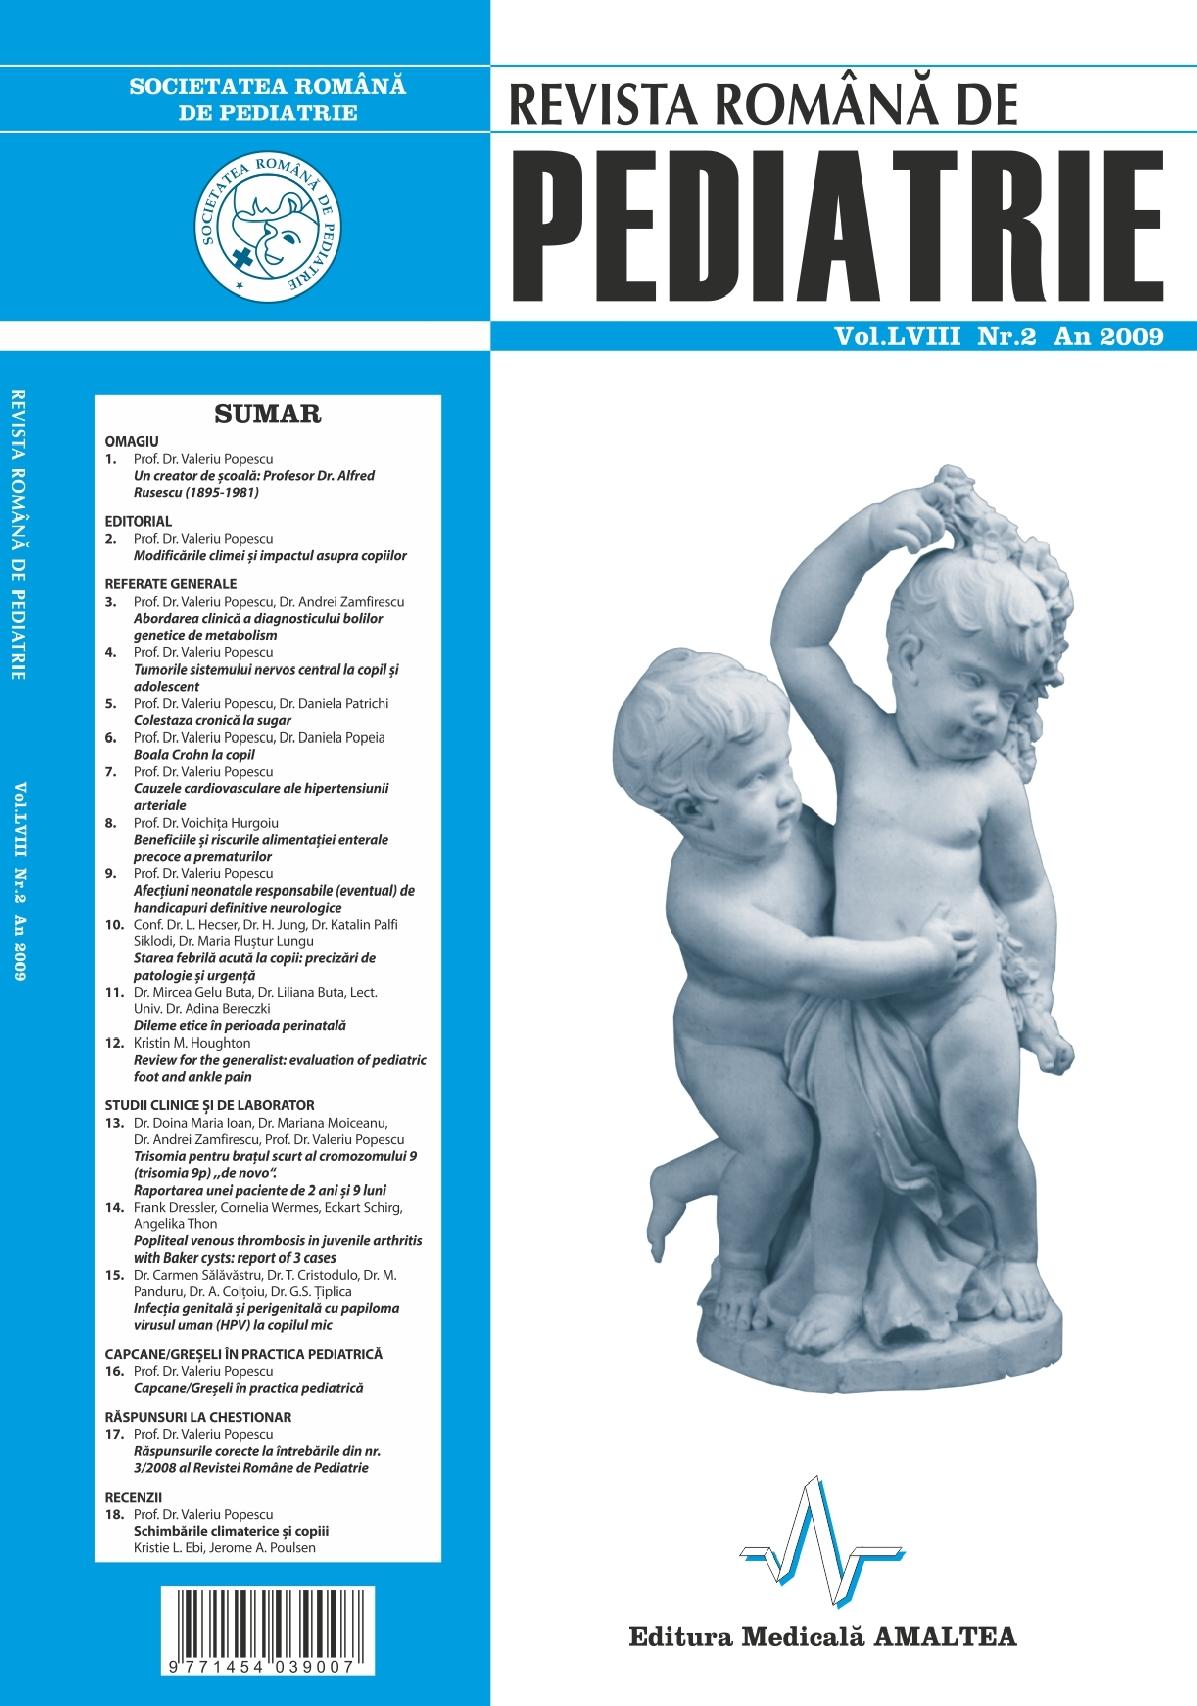 Revista Romana de PEDIATRIE | Volumul LVIII, No. 2, Year 2009